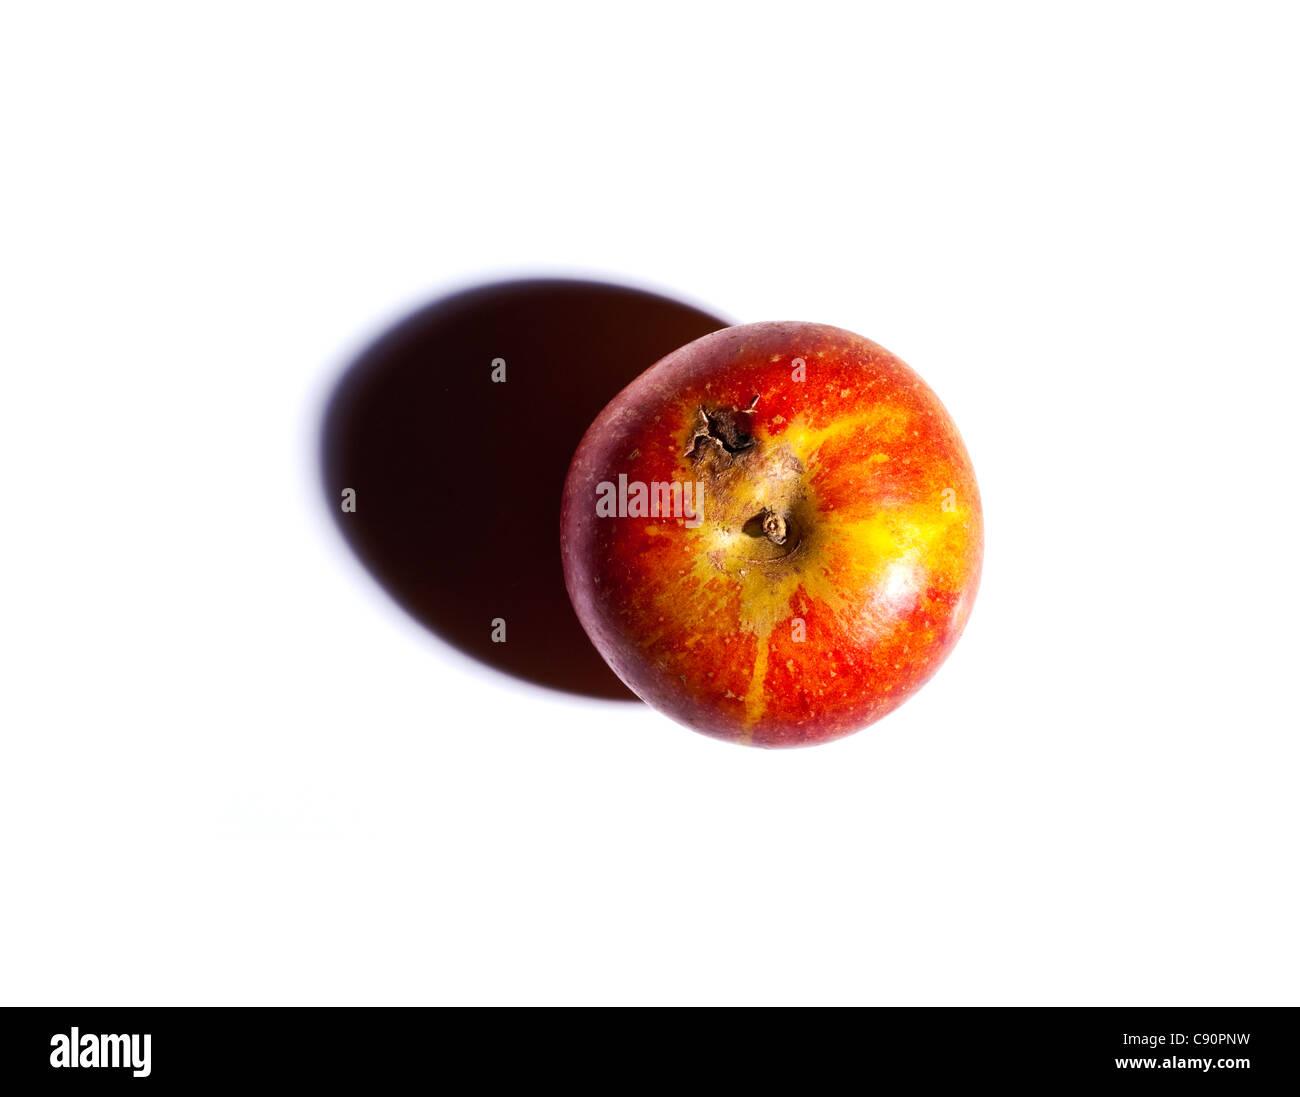 Red apple, studio shot - Stock Image